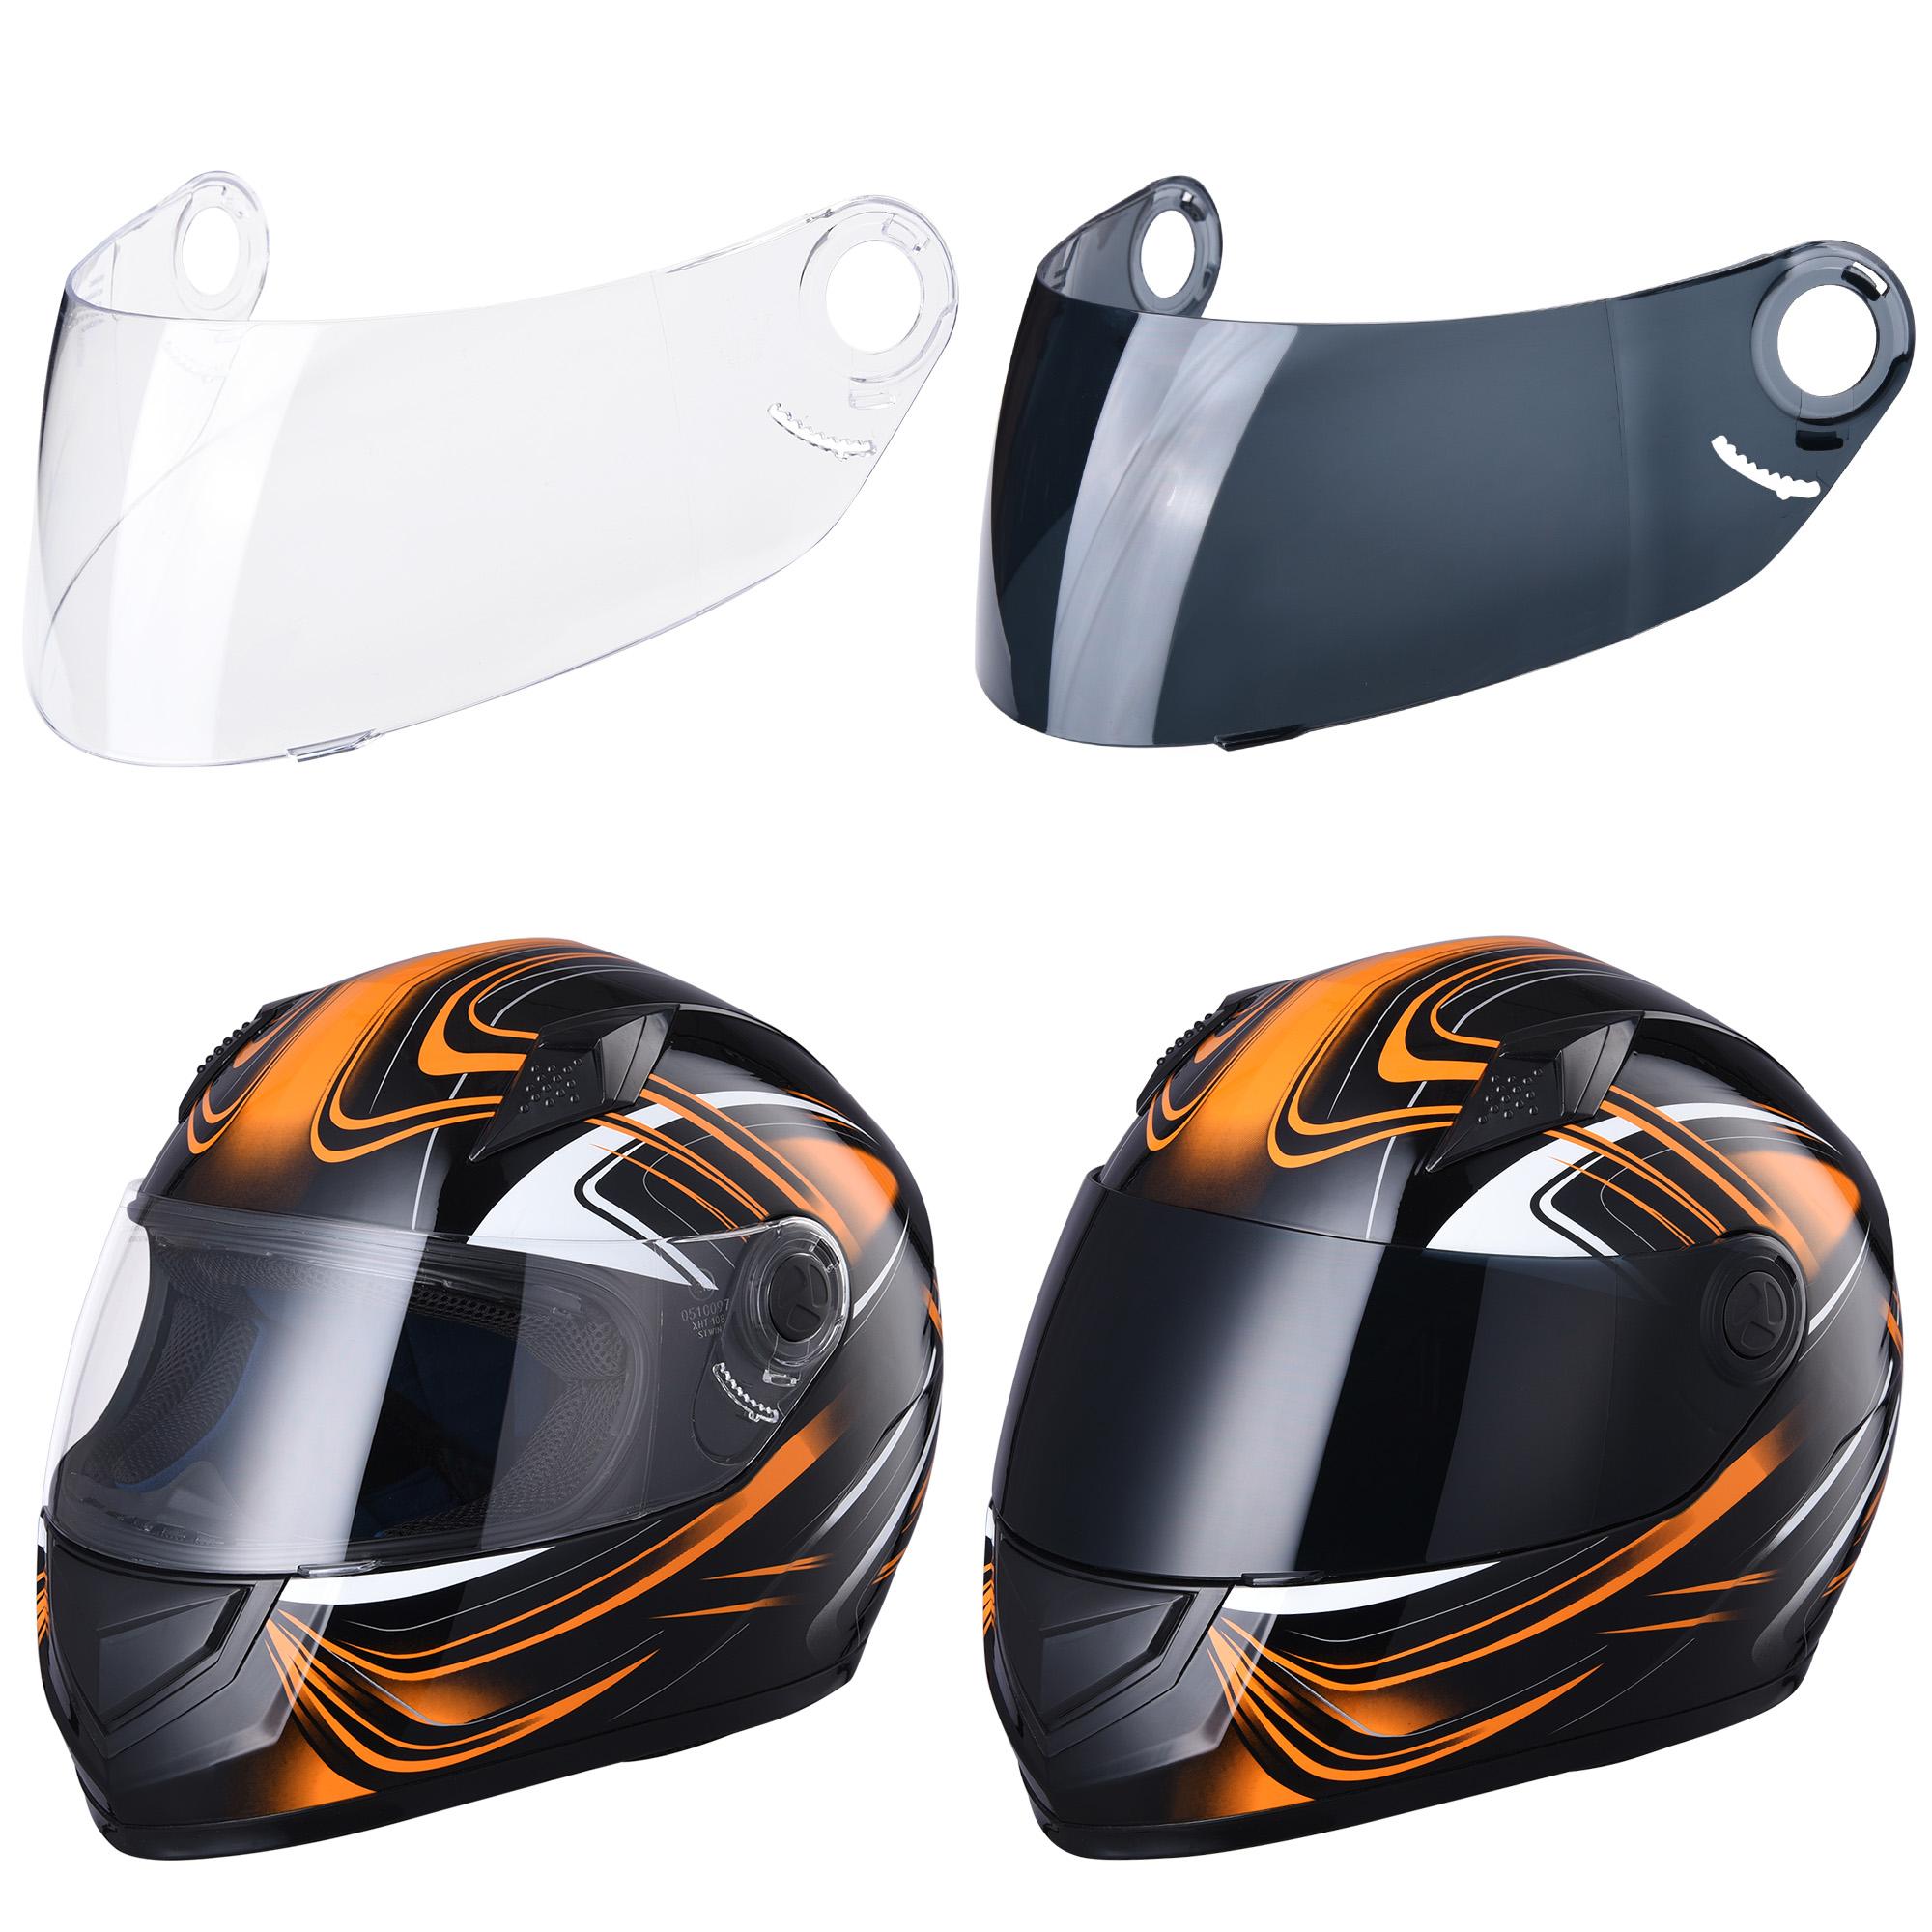 miniature 43 - AHR K12 Full Face Motorcycle Helmet DOT Air Vents Clear Visor Racing S M L XL